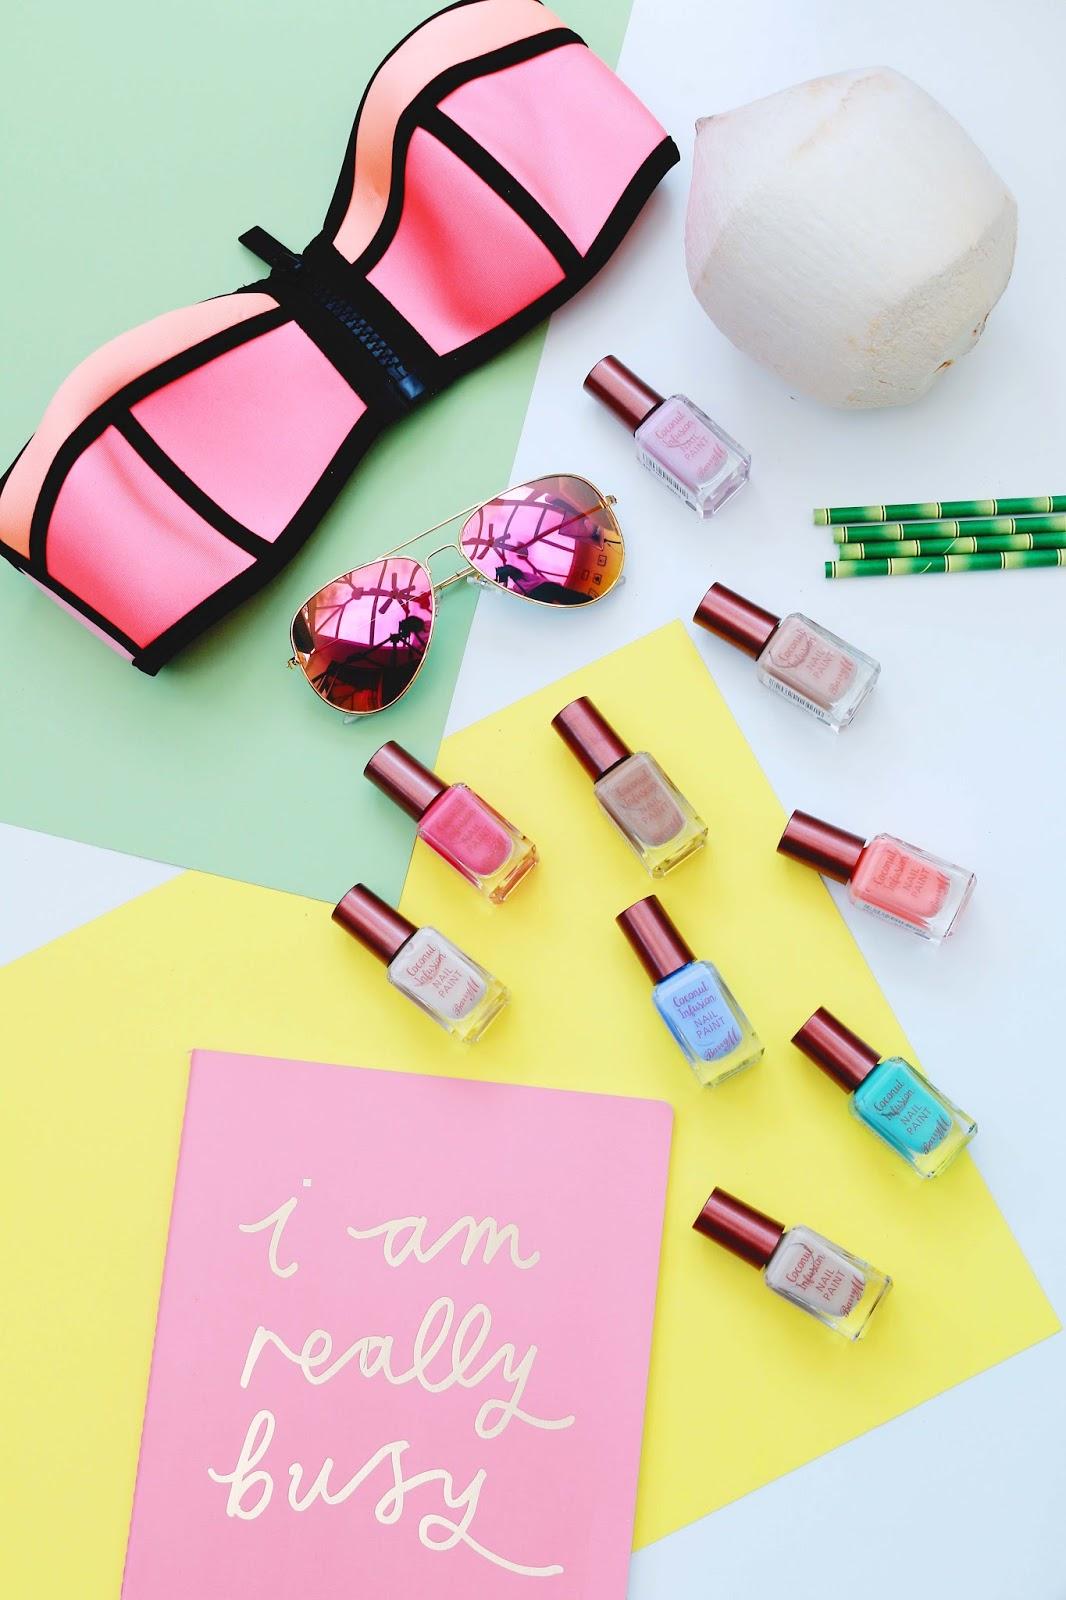 Beauty, Nails, Drugstore, Barry M, Barry M Cosmetics, Summer Nails, Boots, Drugstore, Barry M Coconut Infusion Range